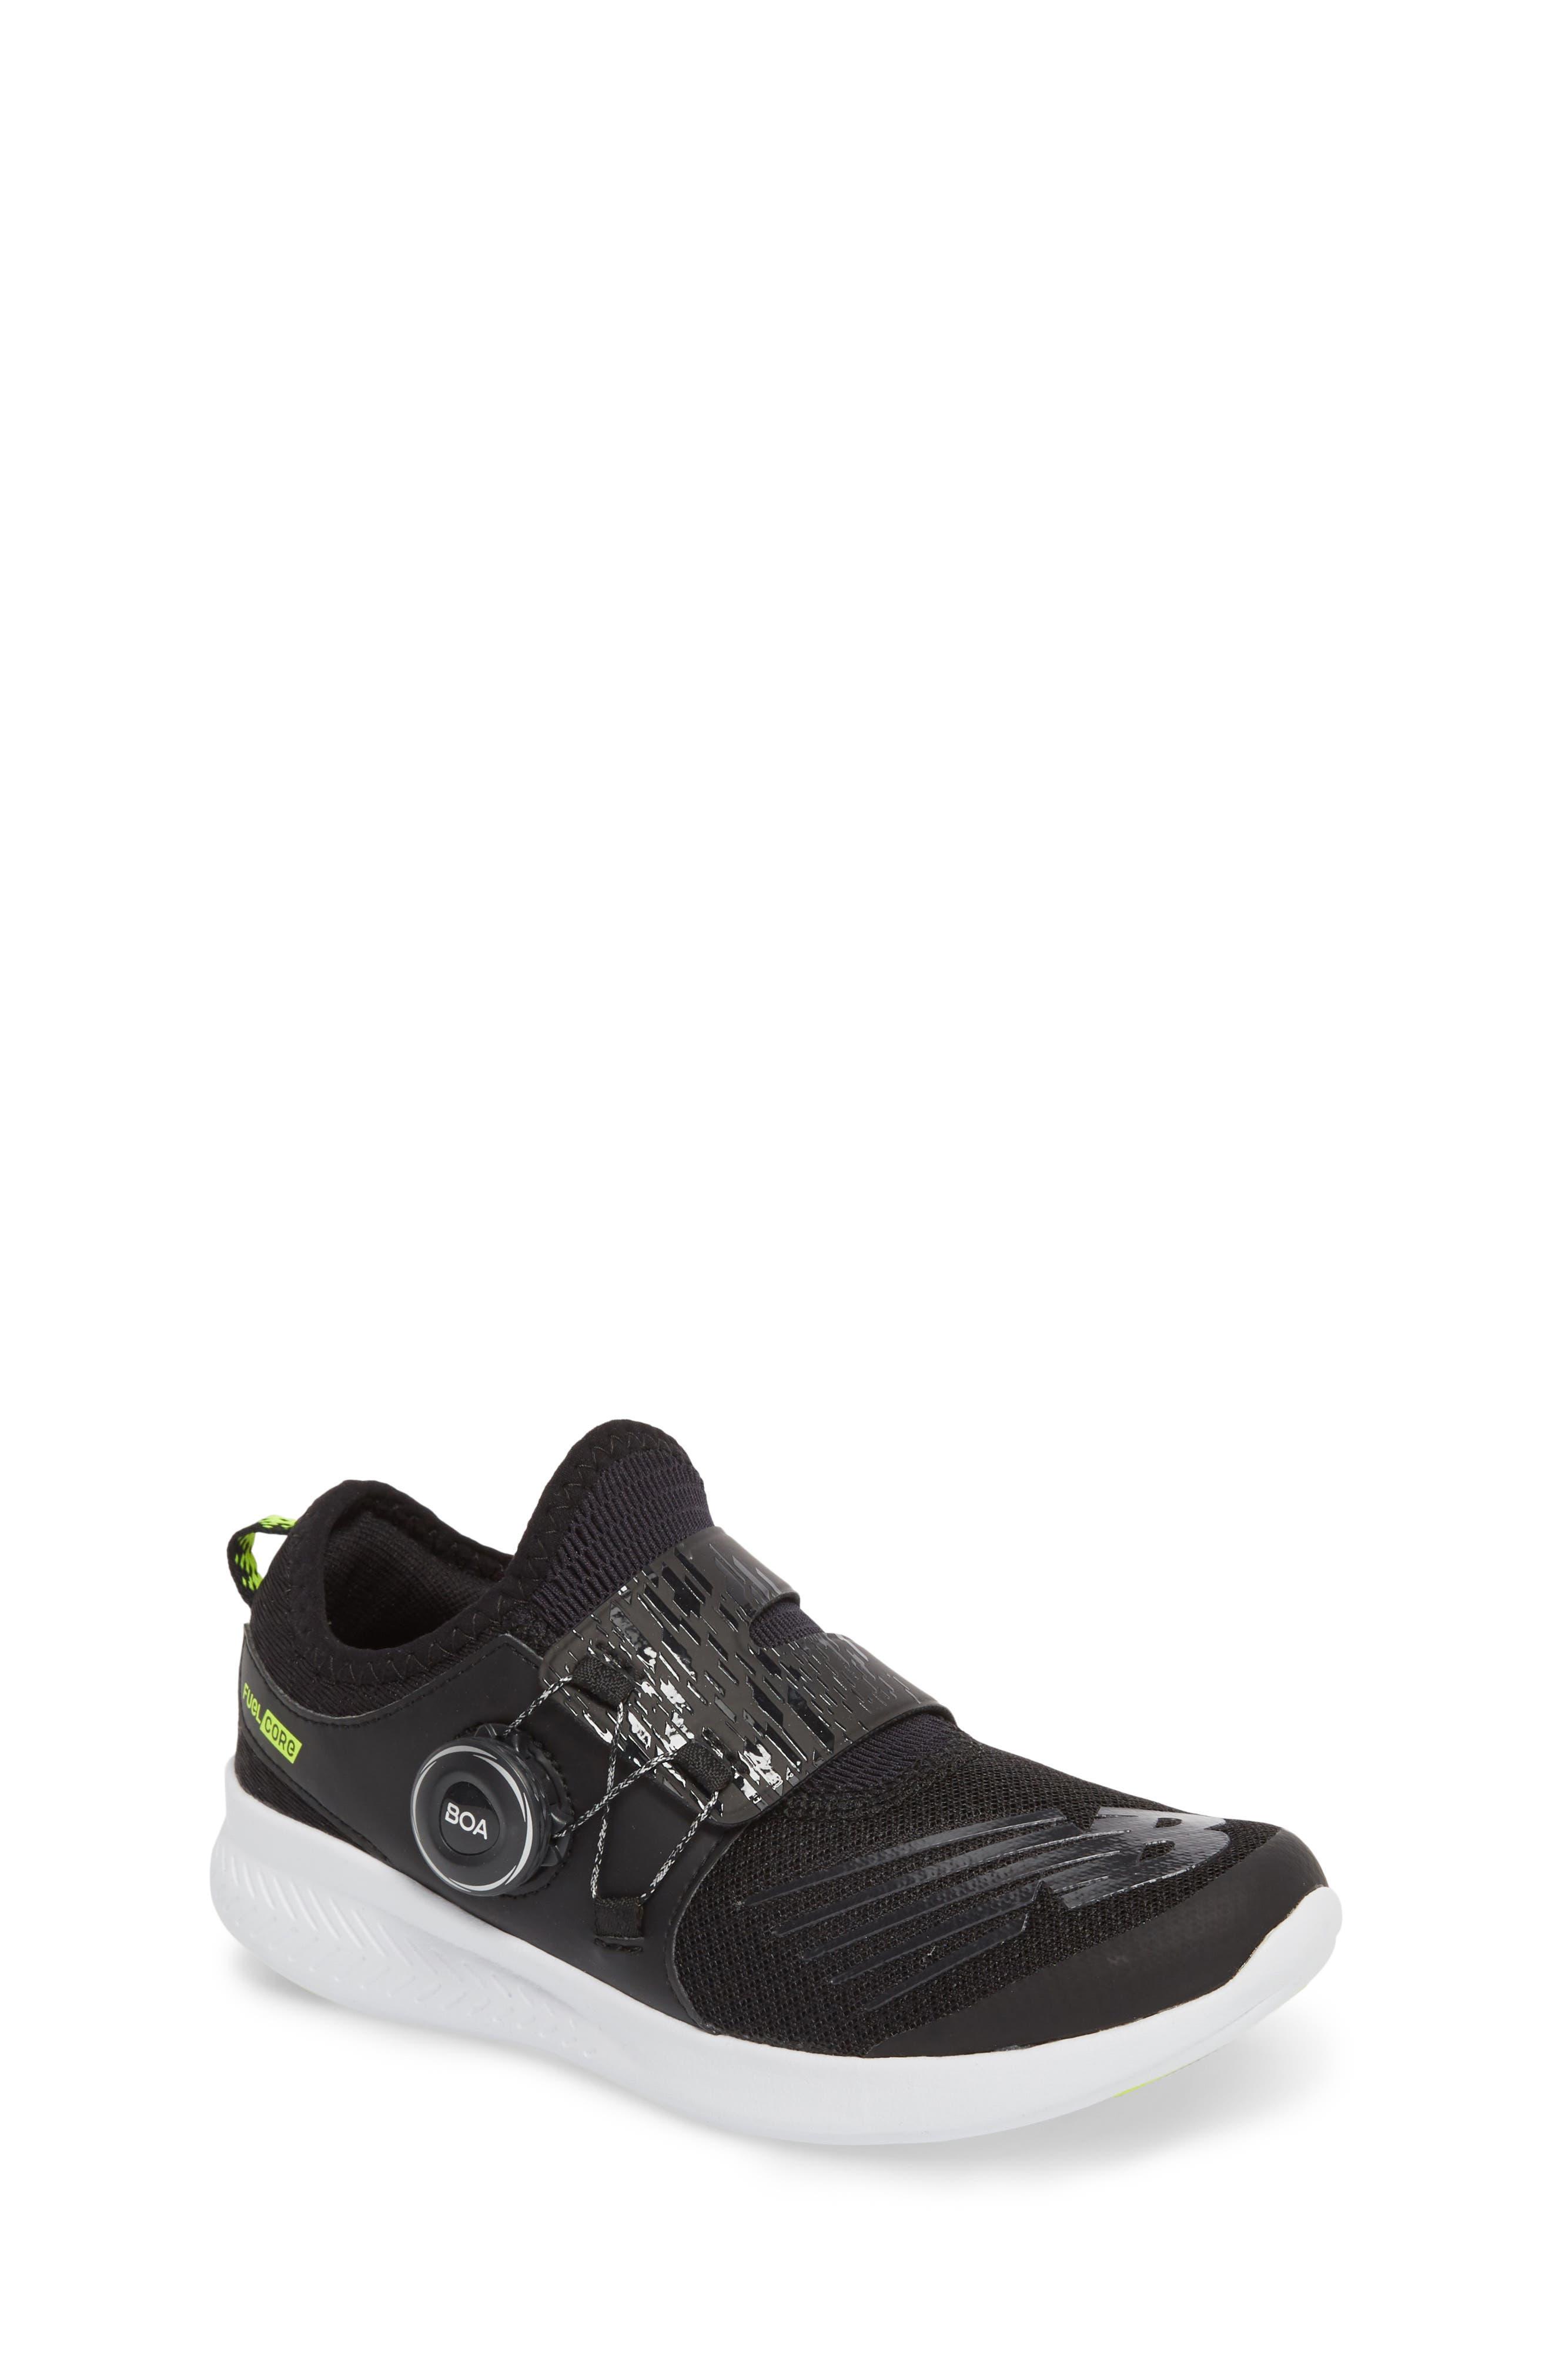 BKO Running Shoe,                             Main thumbnail 1, color,                             Black/ Hi Lite